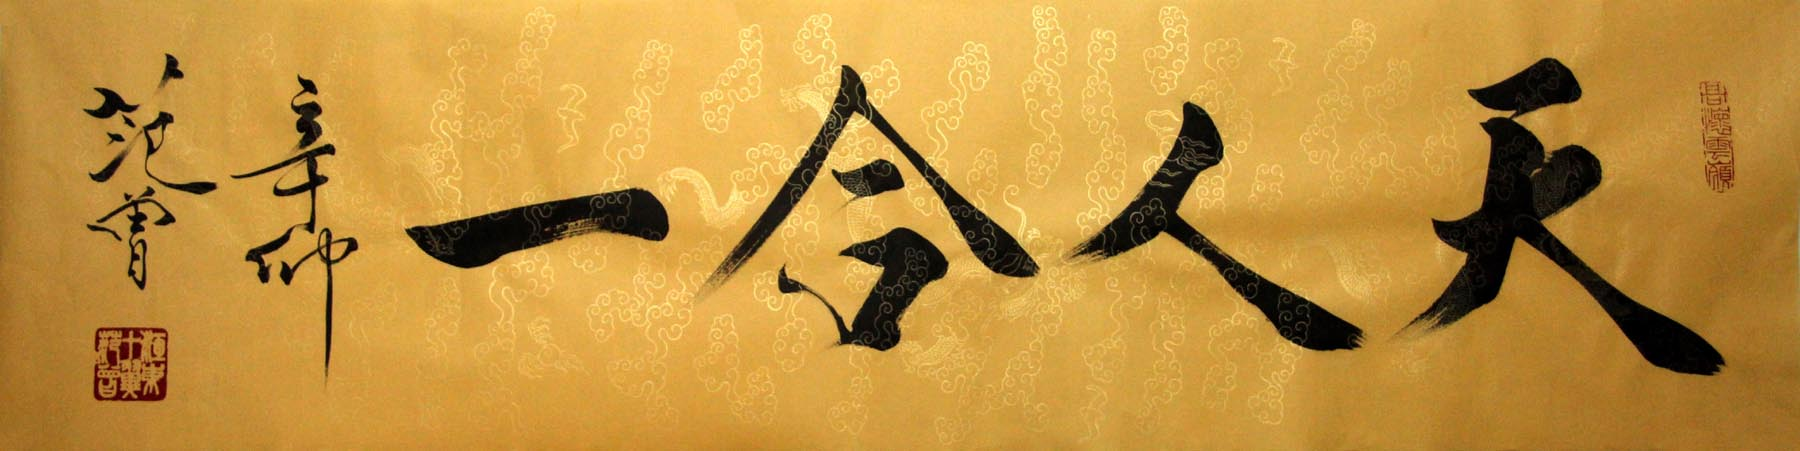 Curso de Caligrafía china